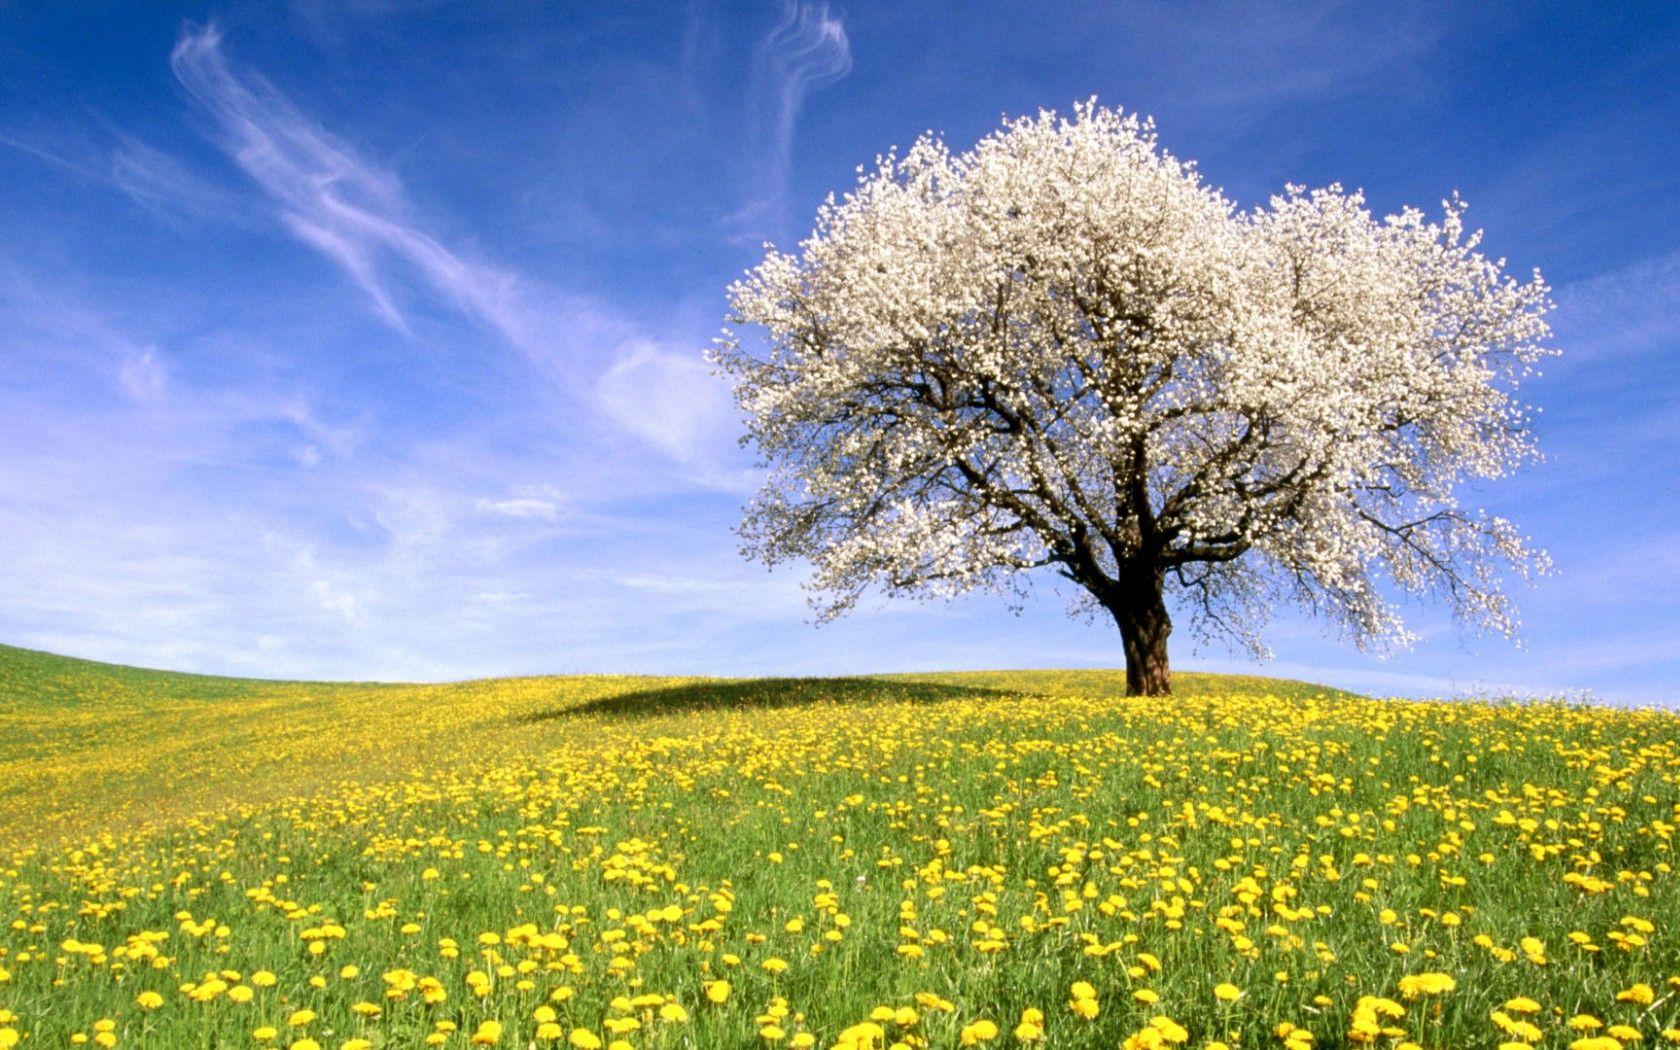 imagenes de la primavera para tu fondo de pantalla